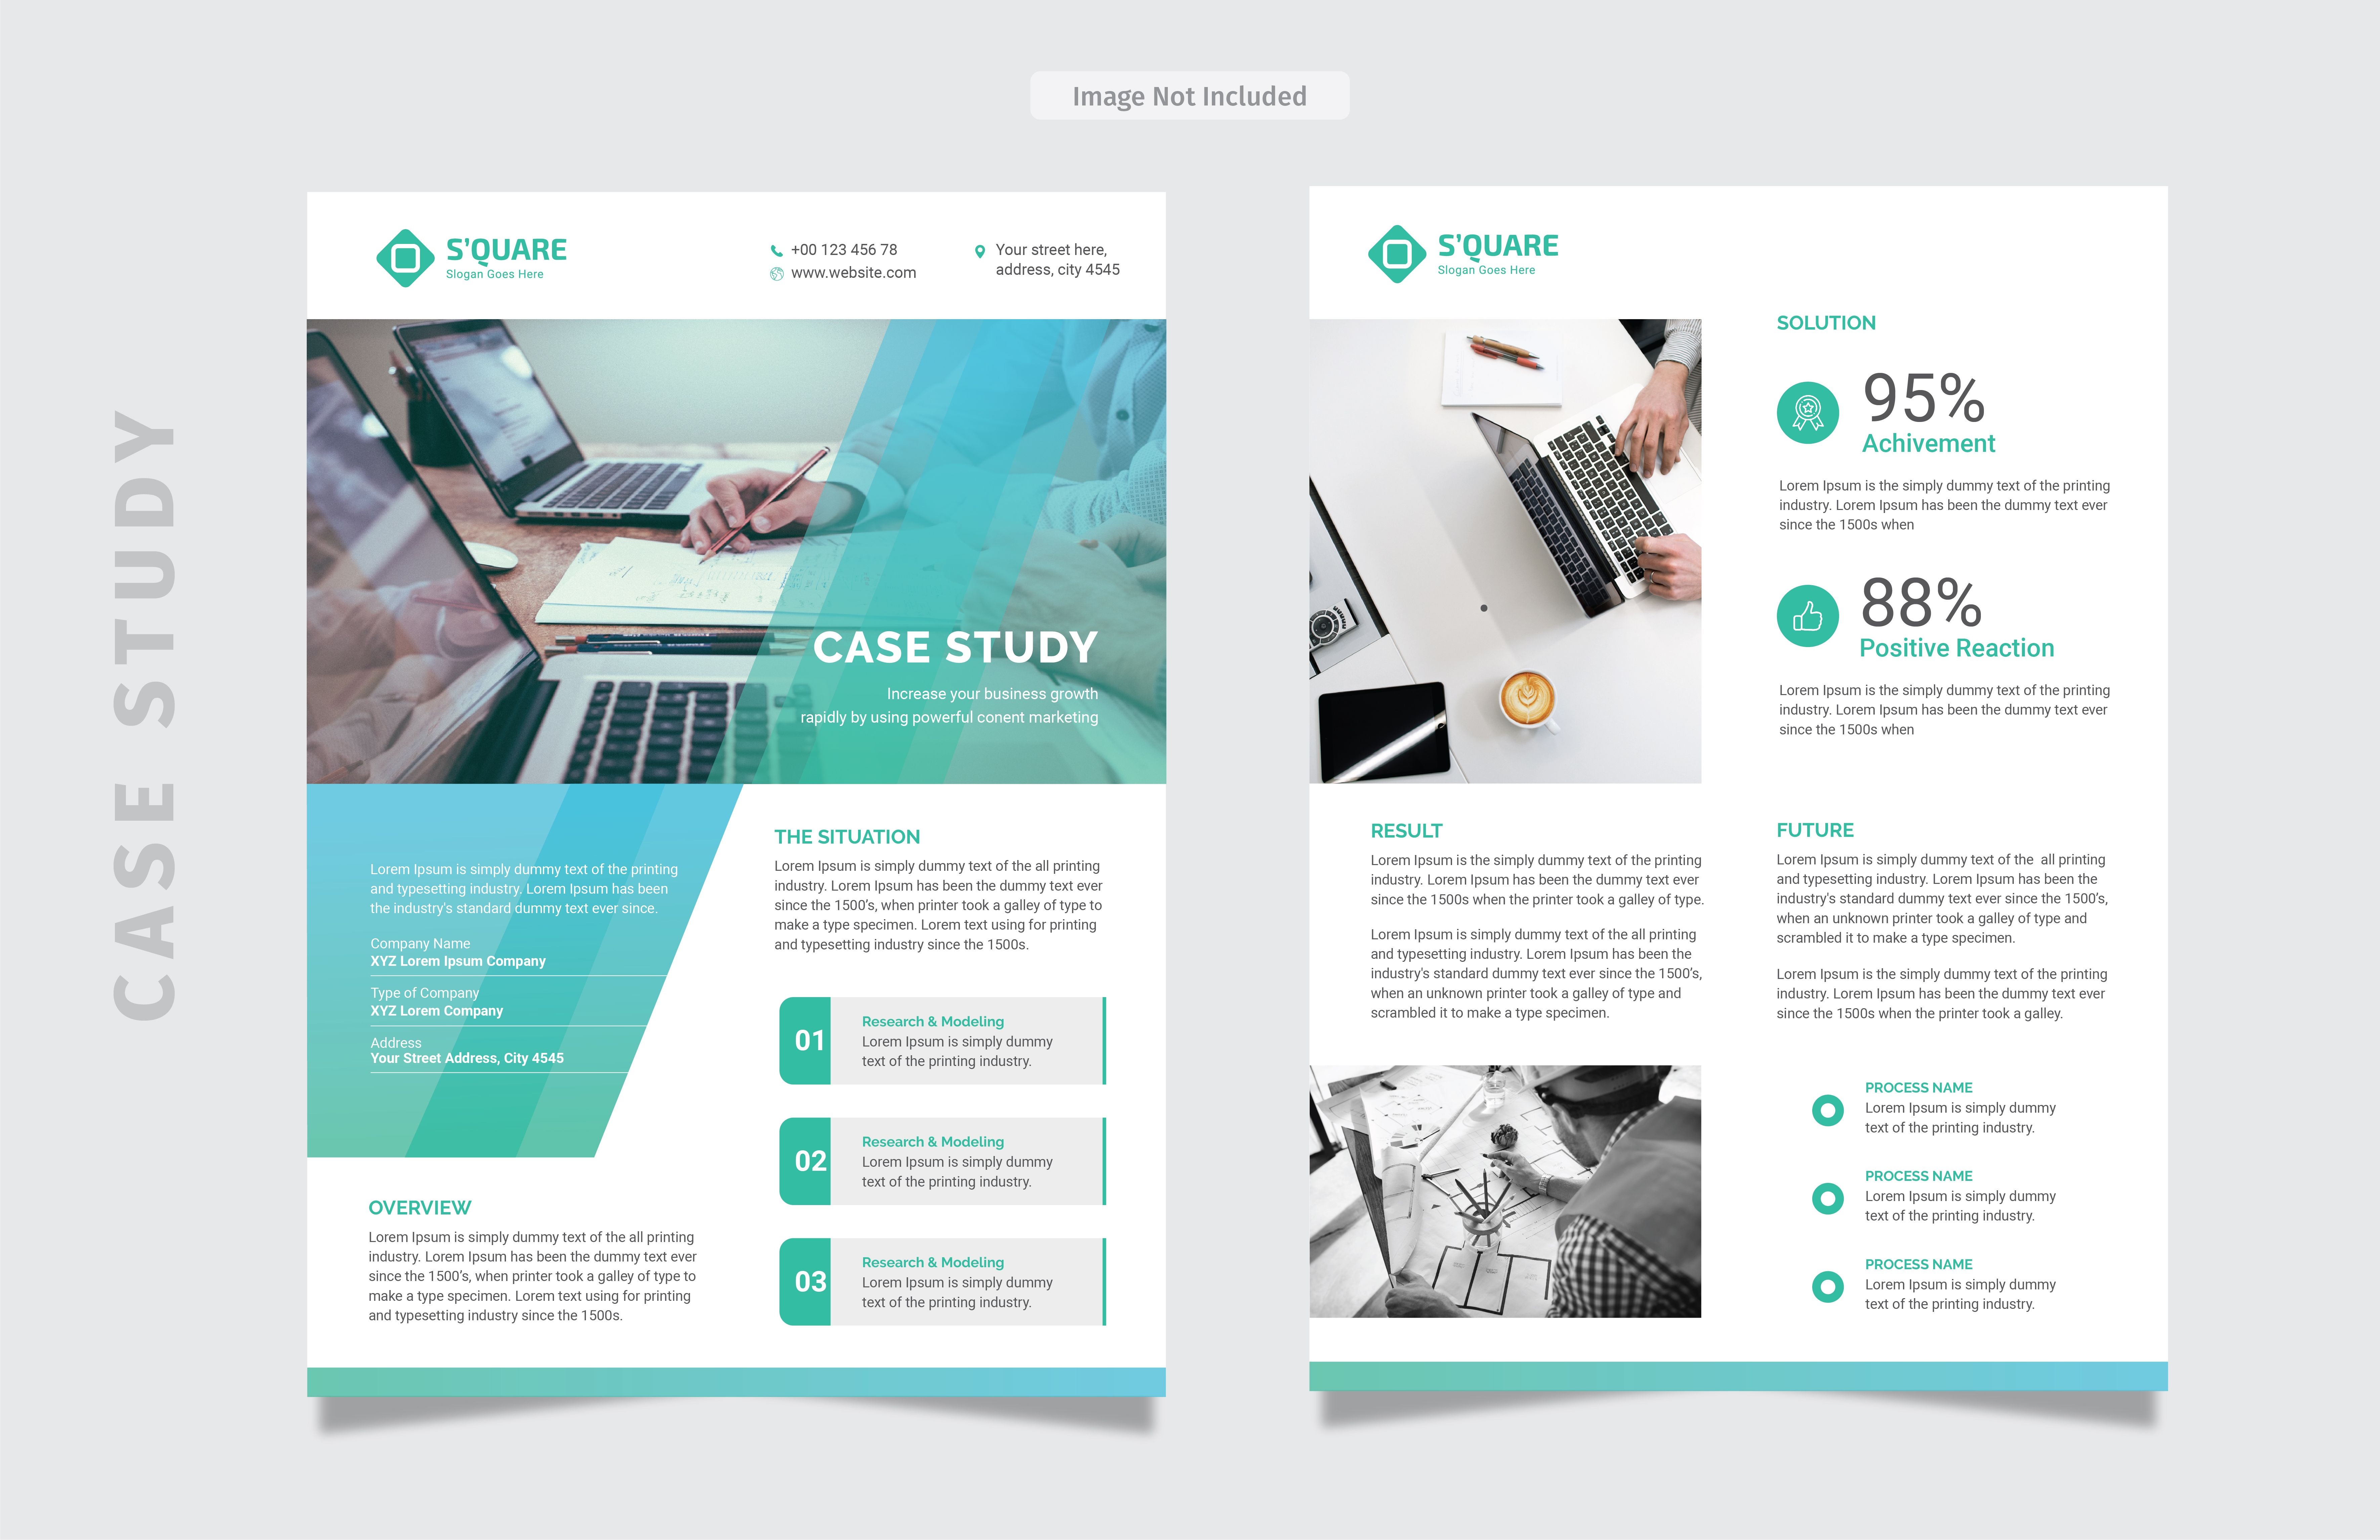 Case Study Template Case Study Design Case Study Template Case Study Template Design